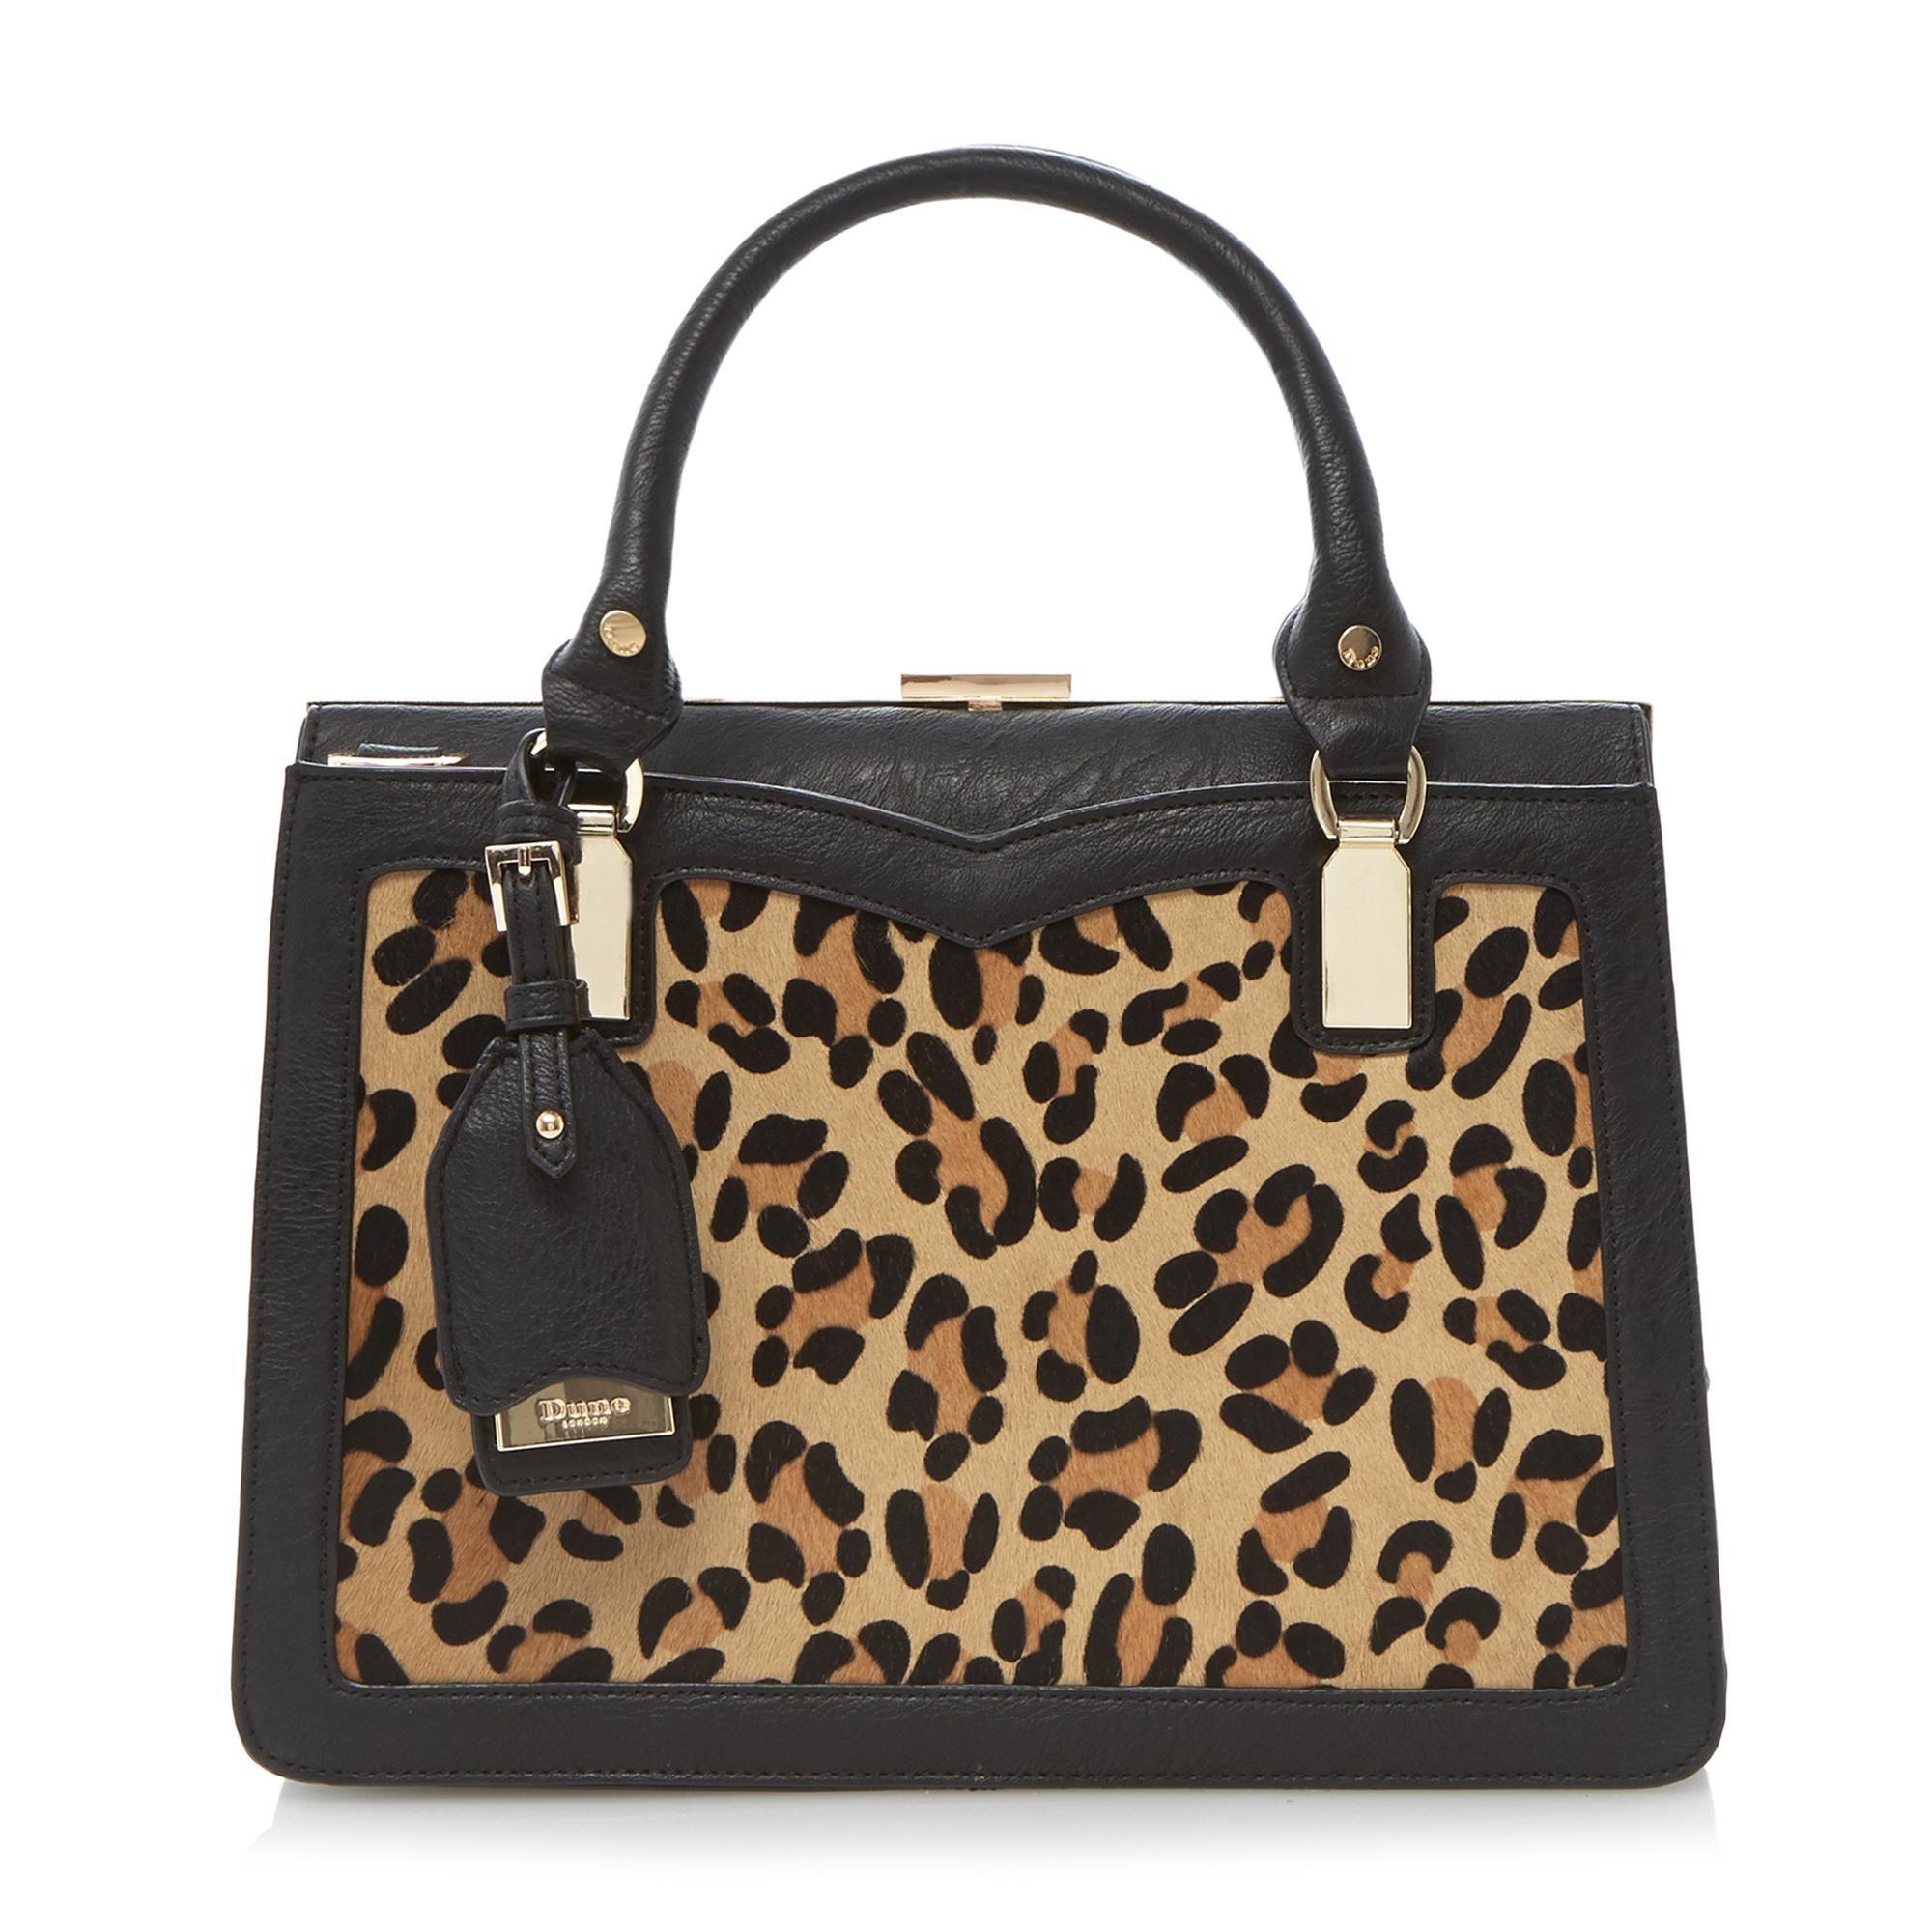 DUNE ACCESSORIES DAPHNE - Pony Leopard Print Structured Bag - leopard | Dune Shoes Online